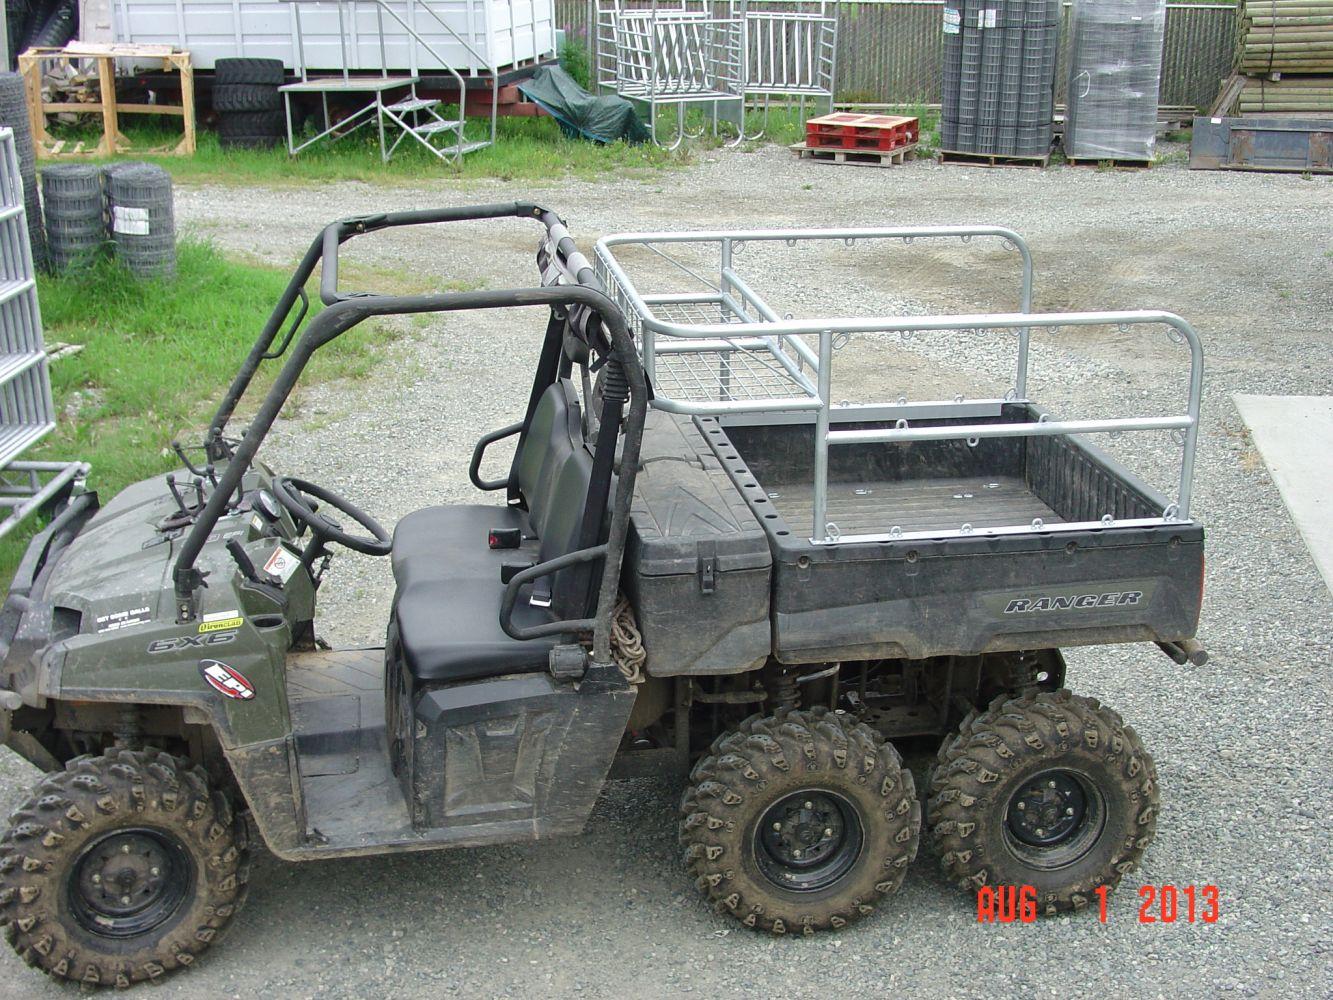 Wheeler Rack customized for a ranger